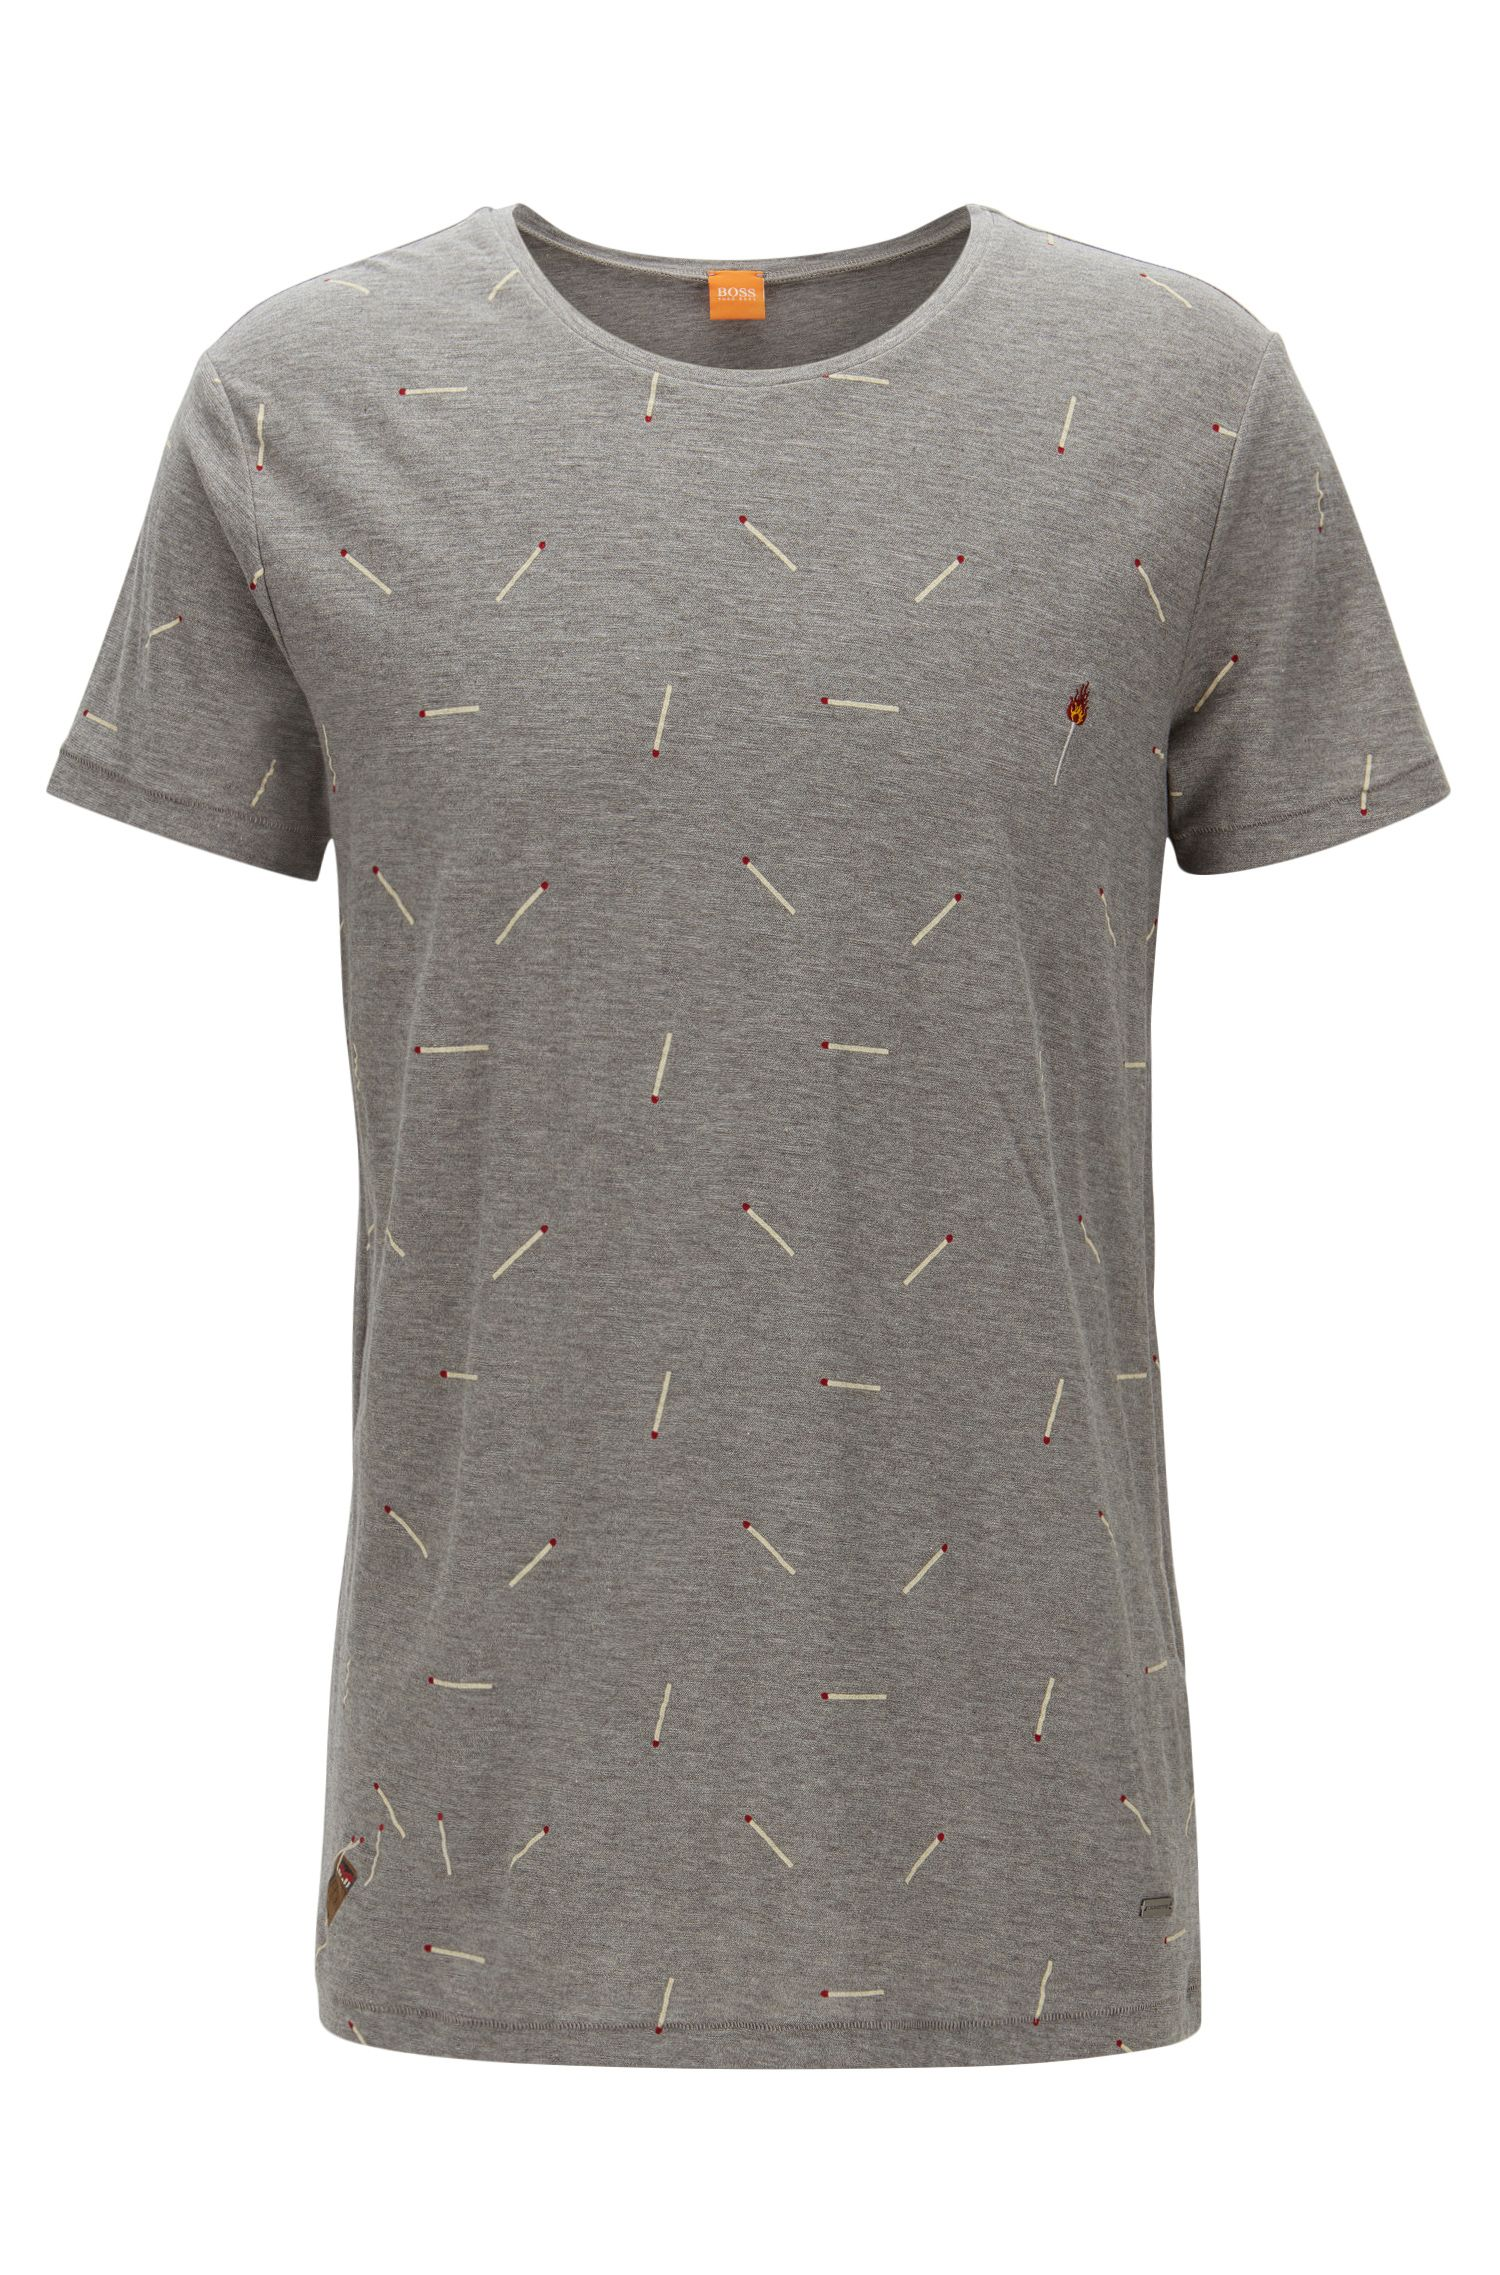 Relaxed-fit T-shirt in slub yarn jersey